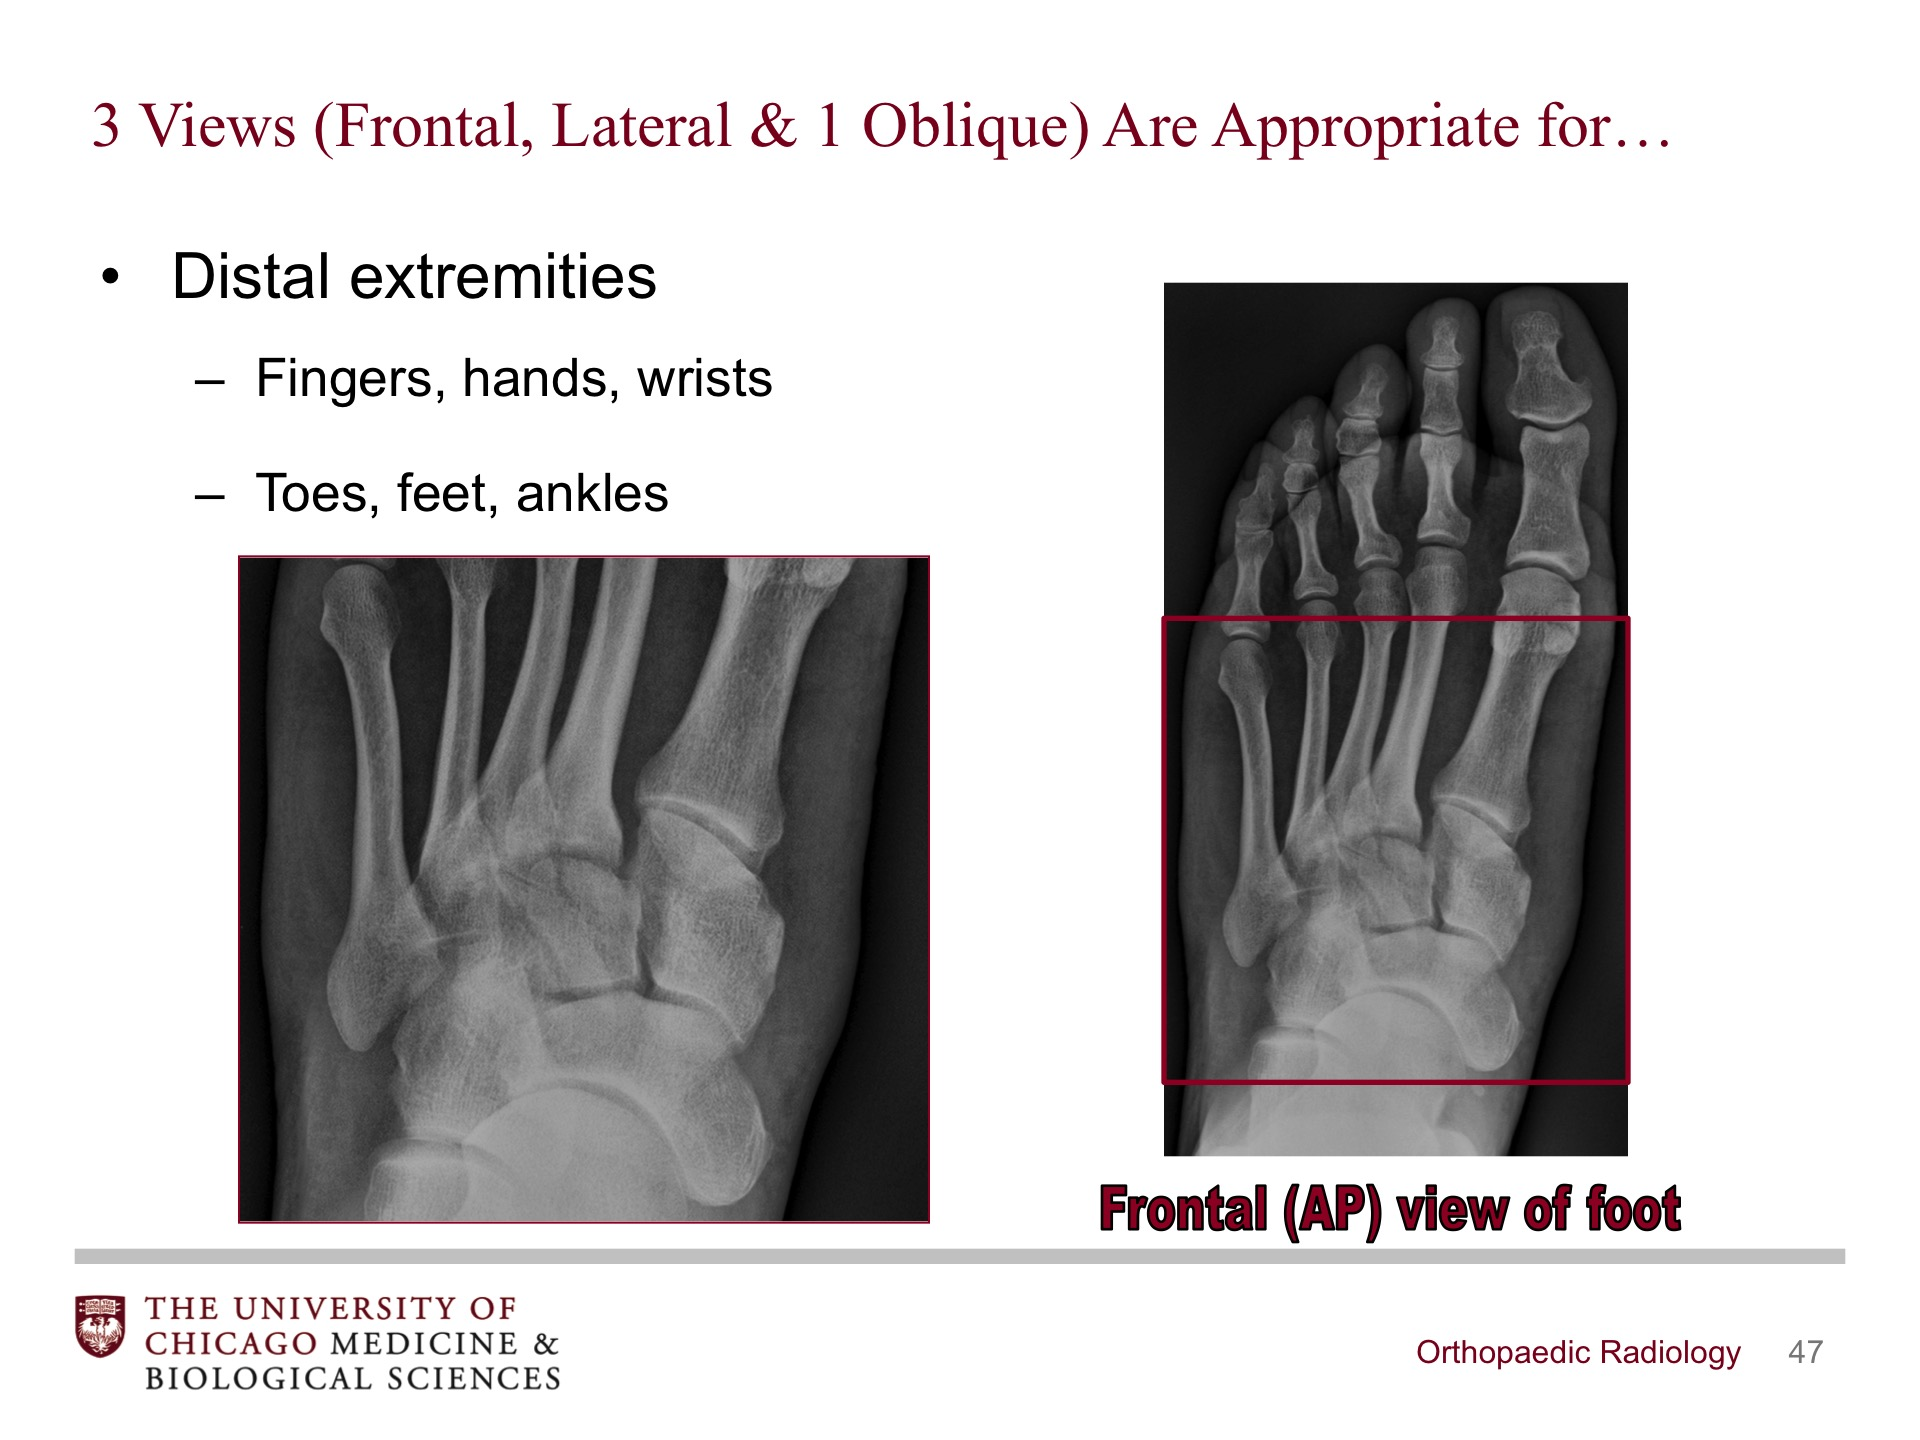 Orthopaedic Radiology - BroadcastMed